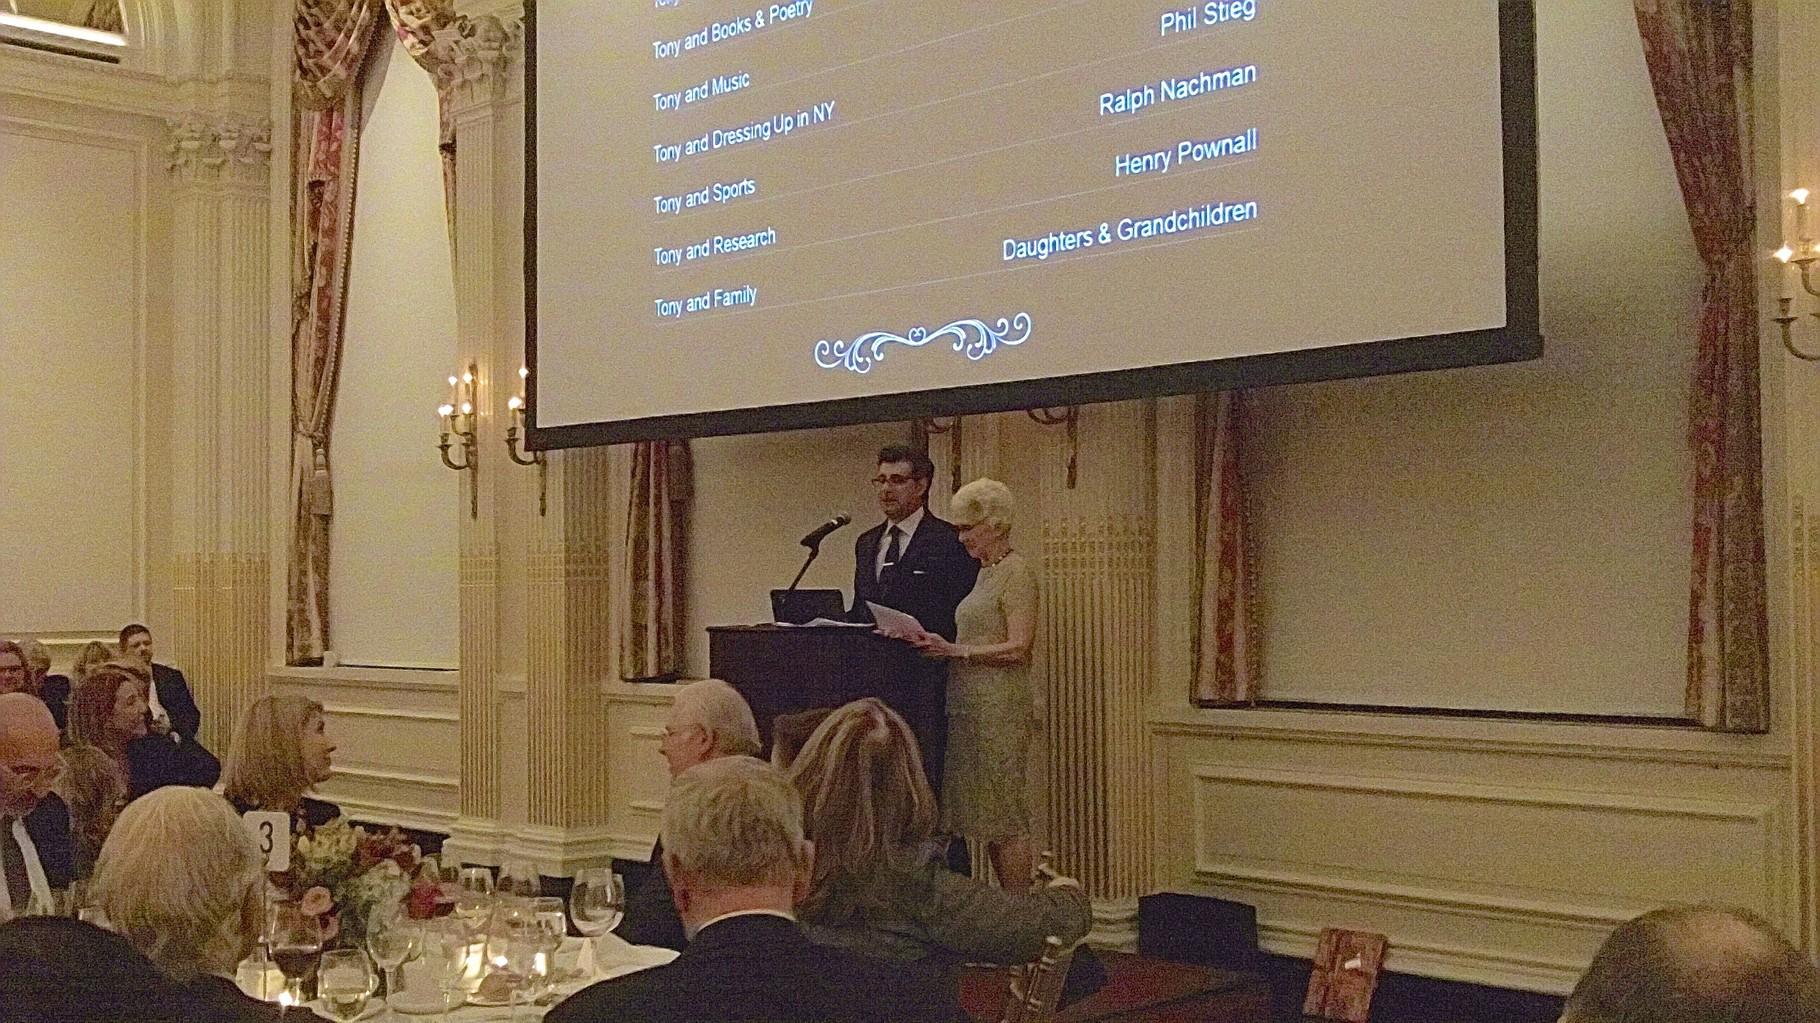 Dr. David Hajjar & Brabara Friedman speak at Dean Gotto's Bday Party